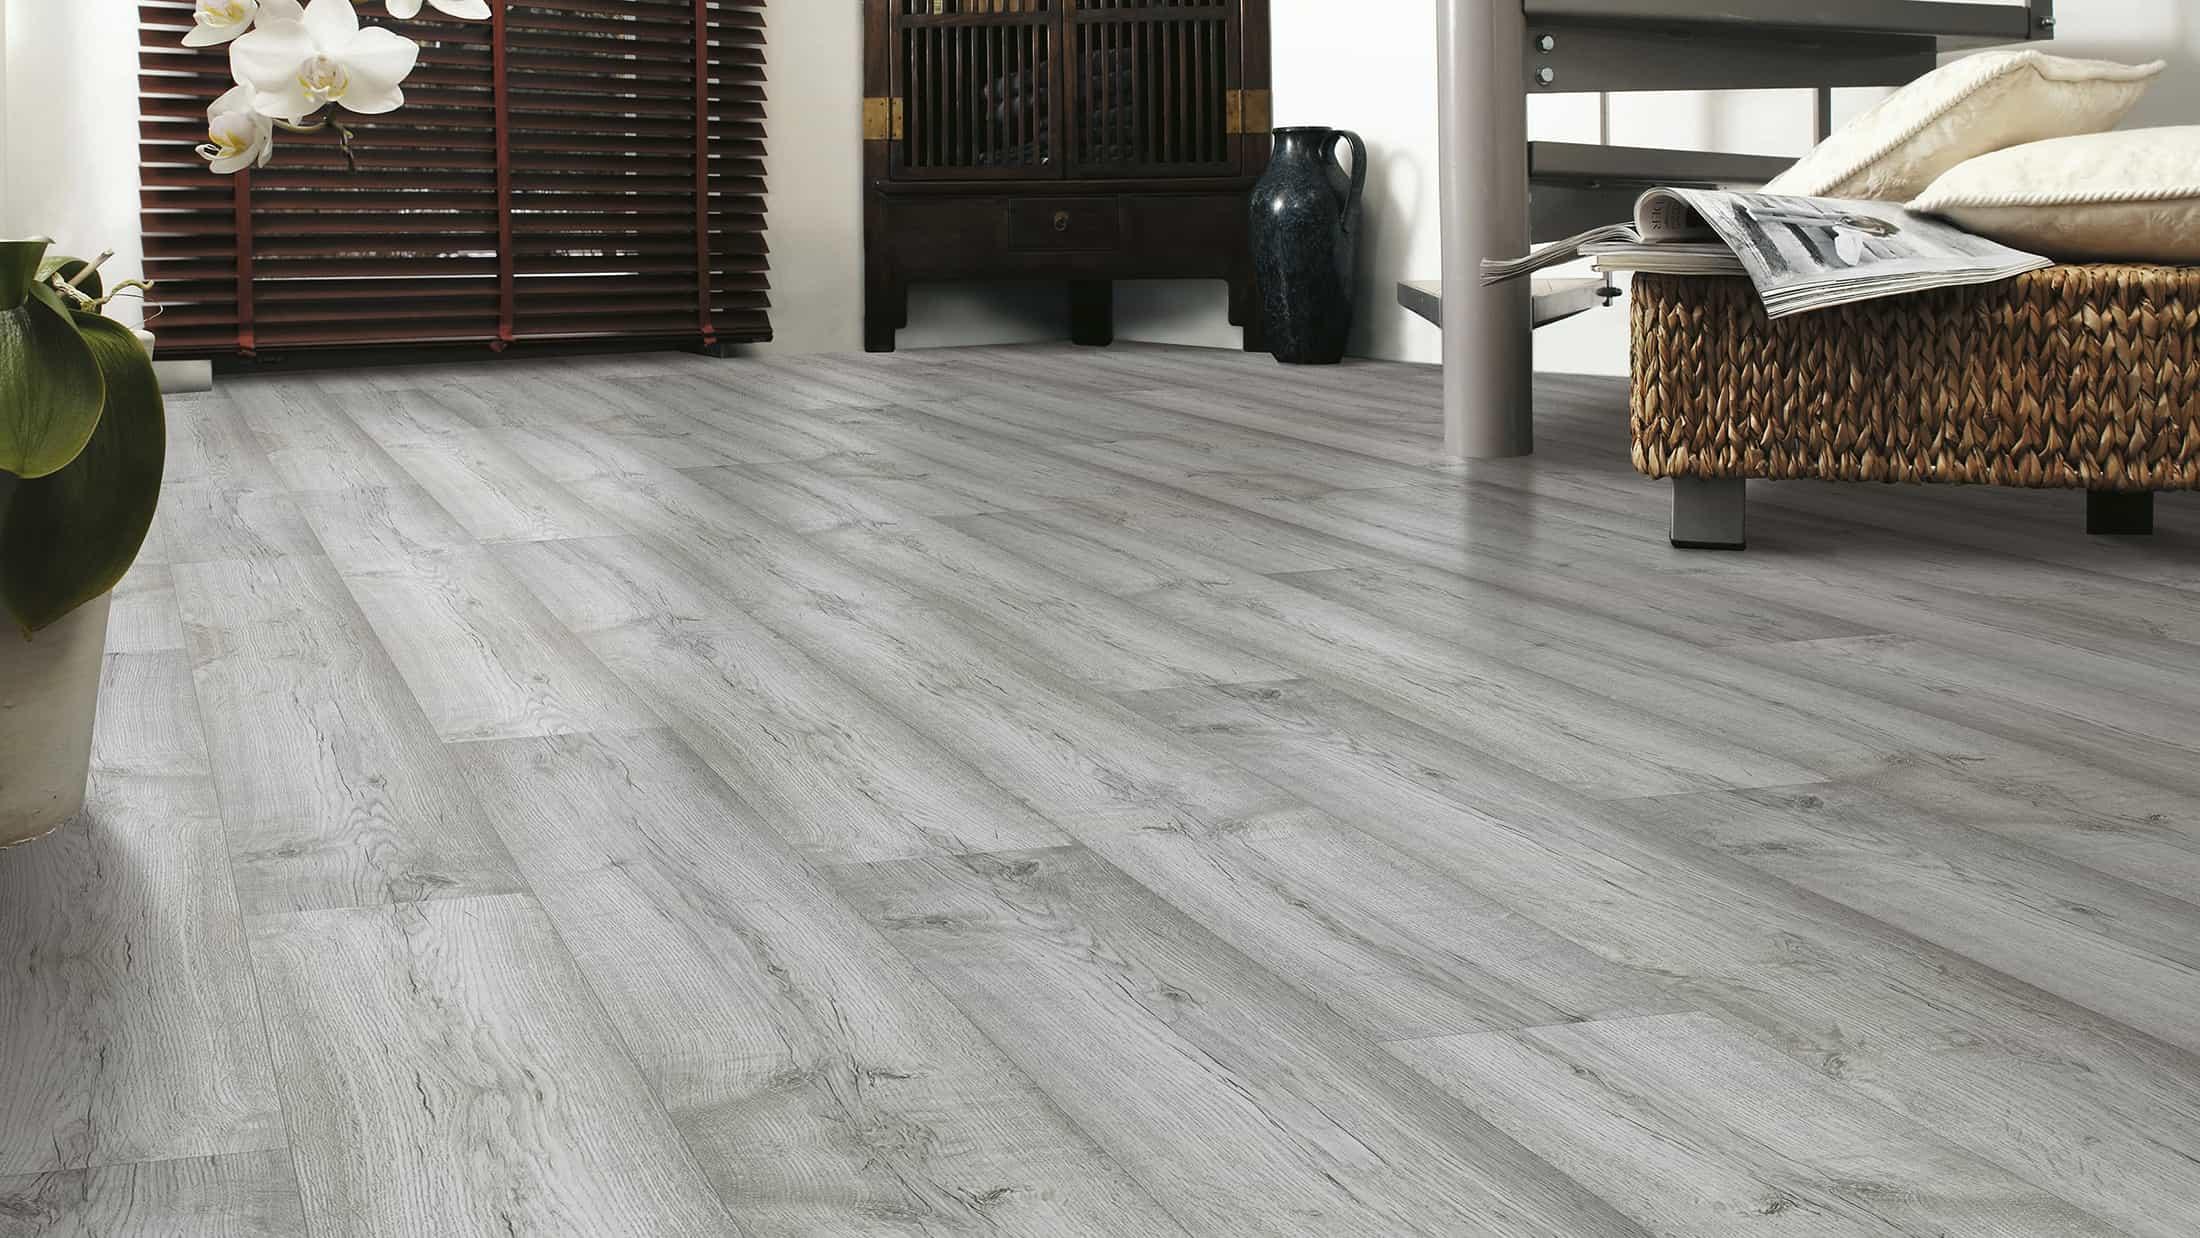 Wood Flooring - Right Price Tiles